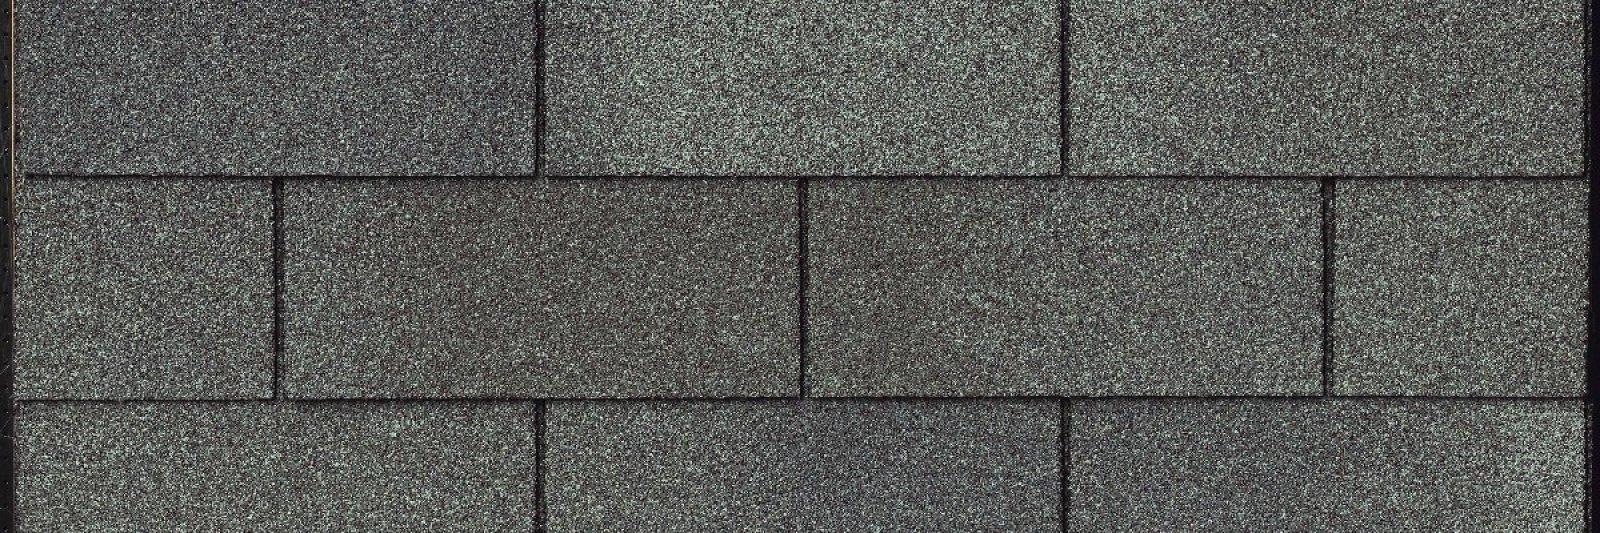 Georgetown Gray image